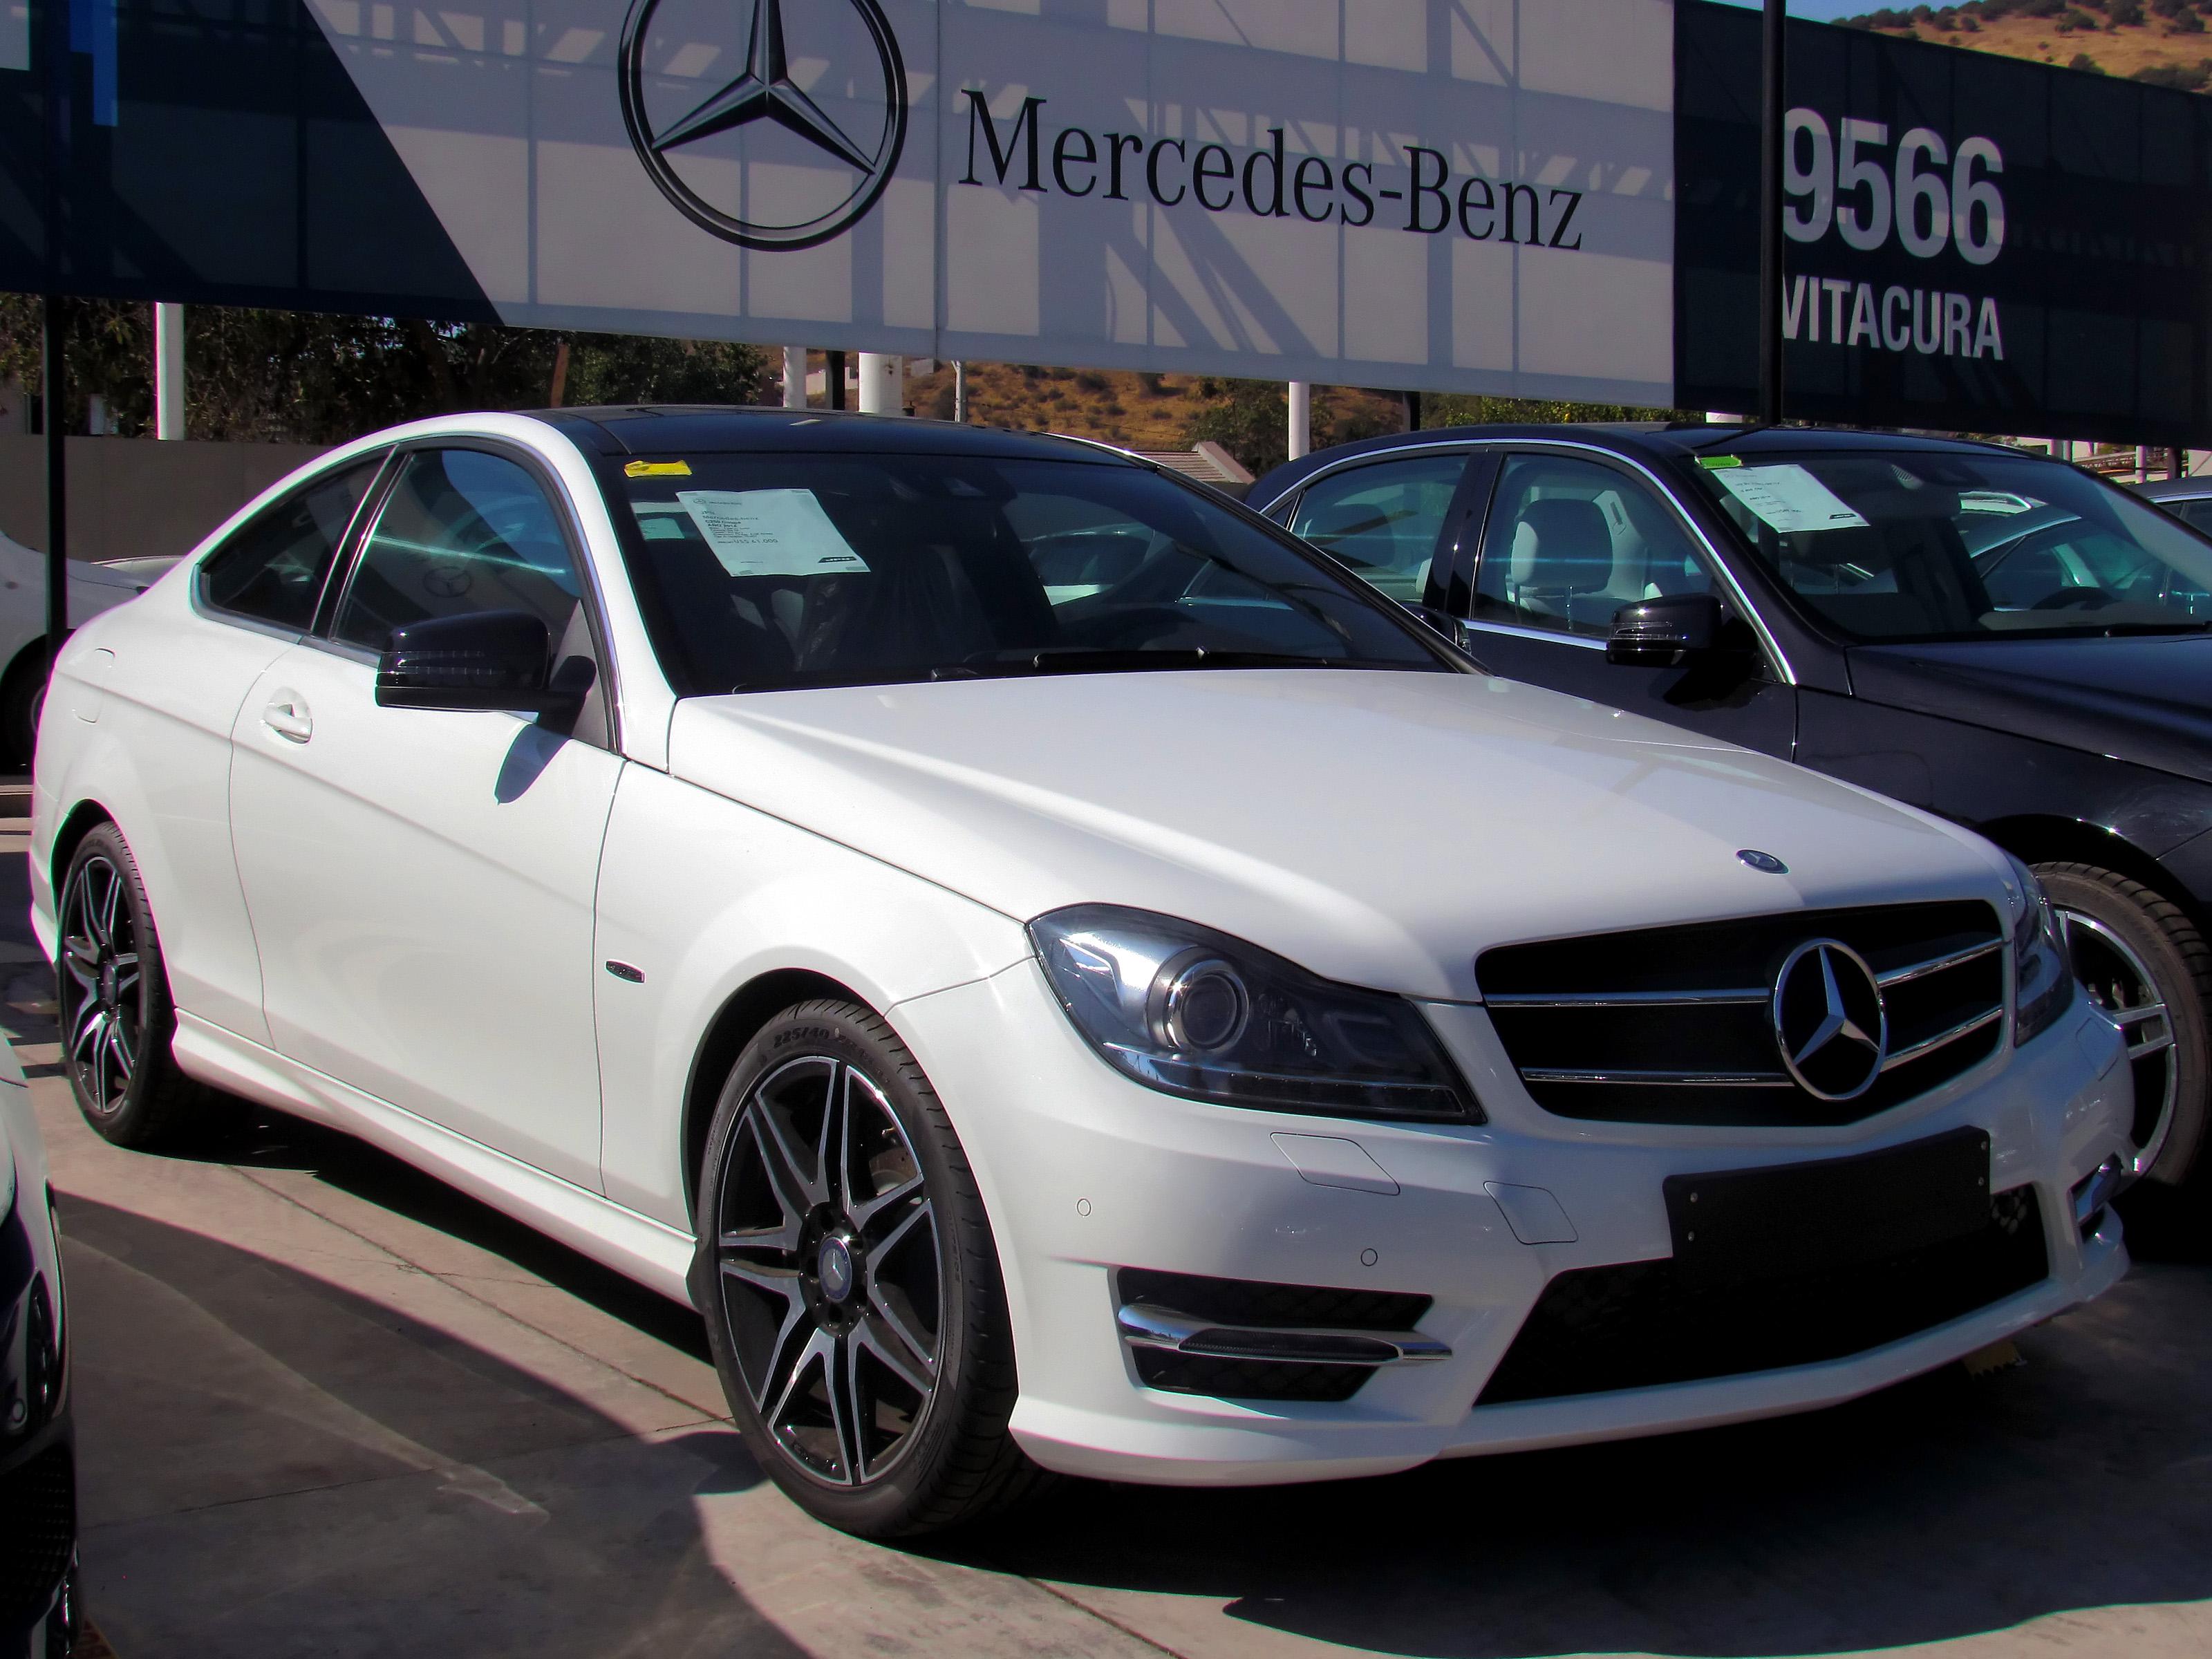 File mercedes benz c 250 coupe 2014 13907088466 jpg wikimedia commons - Mercedes benz c250 coupe 2014 ...